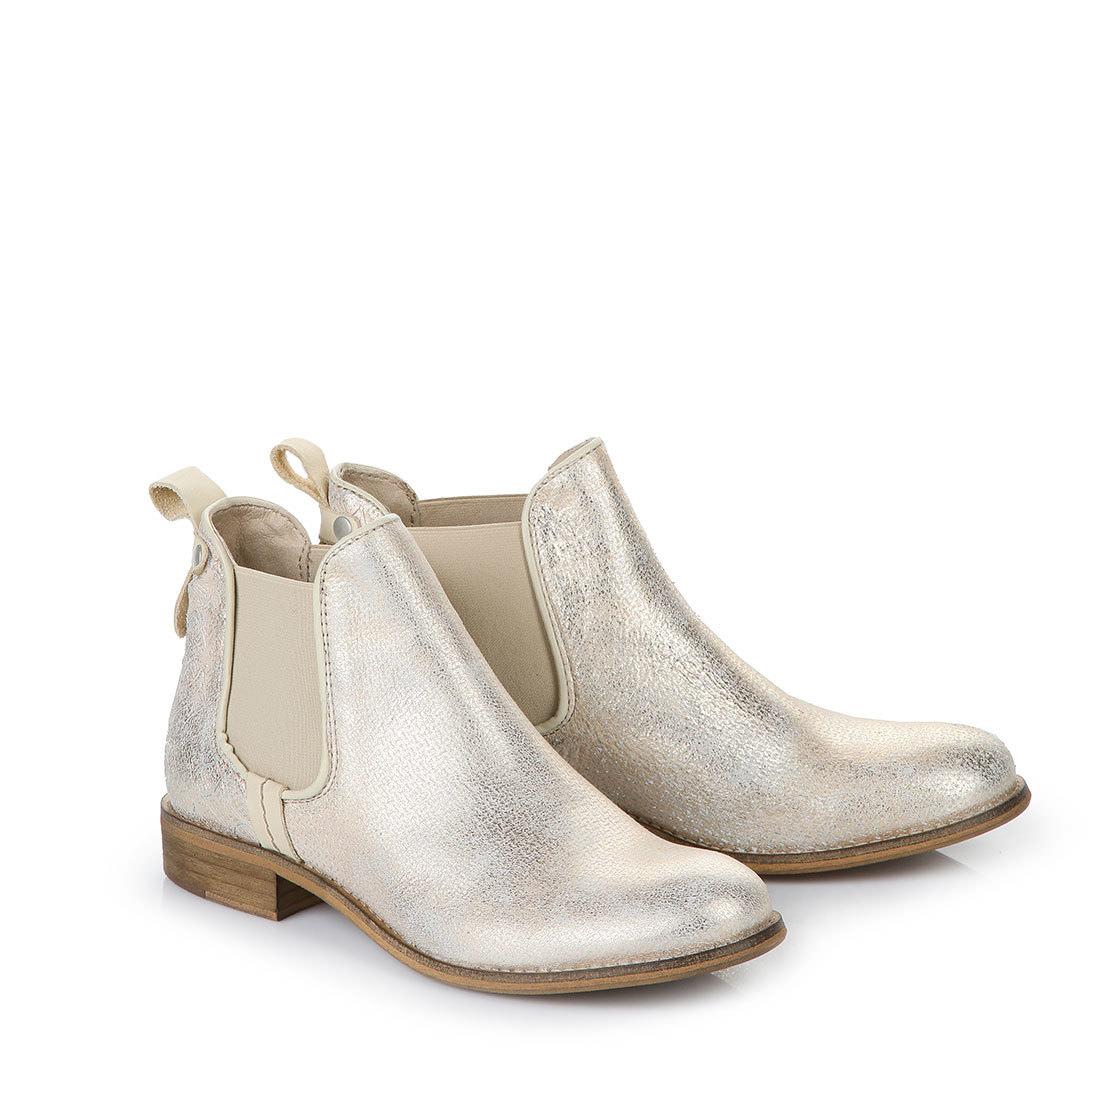 buffalo chelsea boots in gold buy online in buffalo online shop buffalo. Black Bedroom Furniture Sets. Home Design Ideas